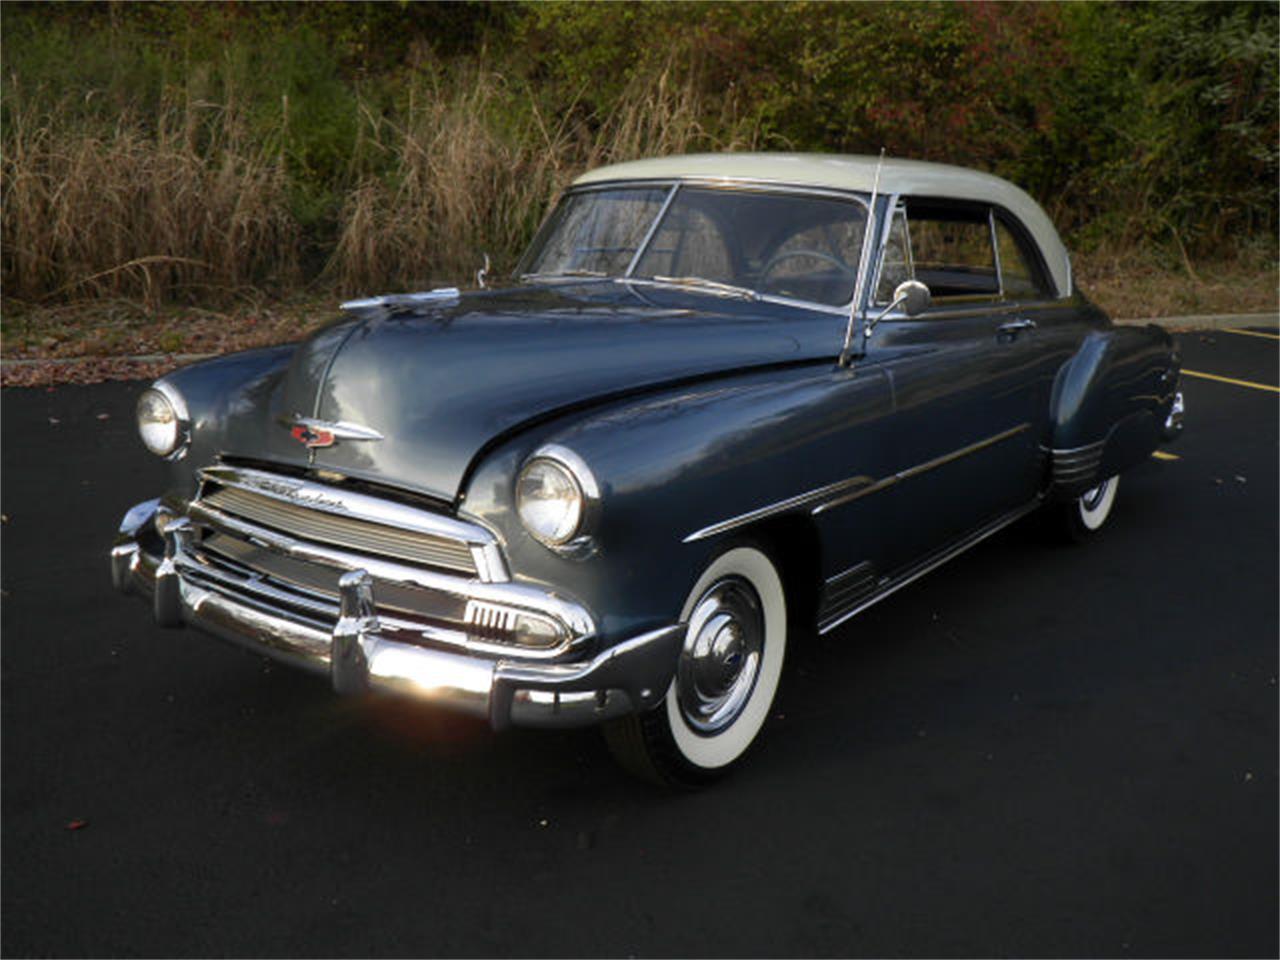 1951 Chevrolet Styleline Deluxe For Sale Cc 1038147 2 Door Hardtop Large Picture Of 51 M91f